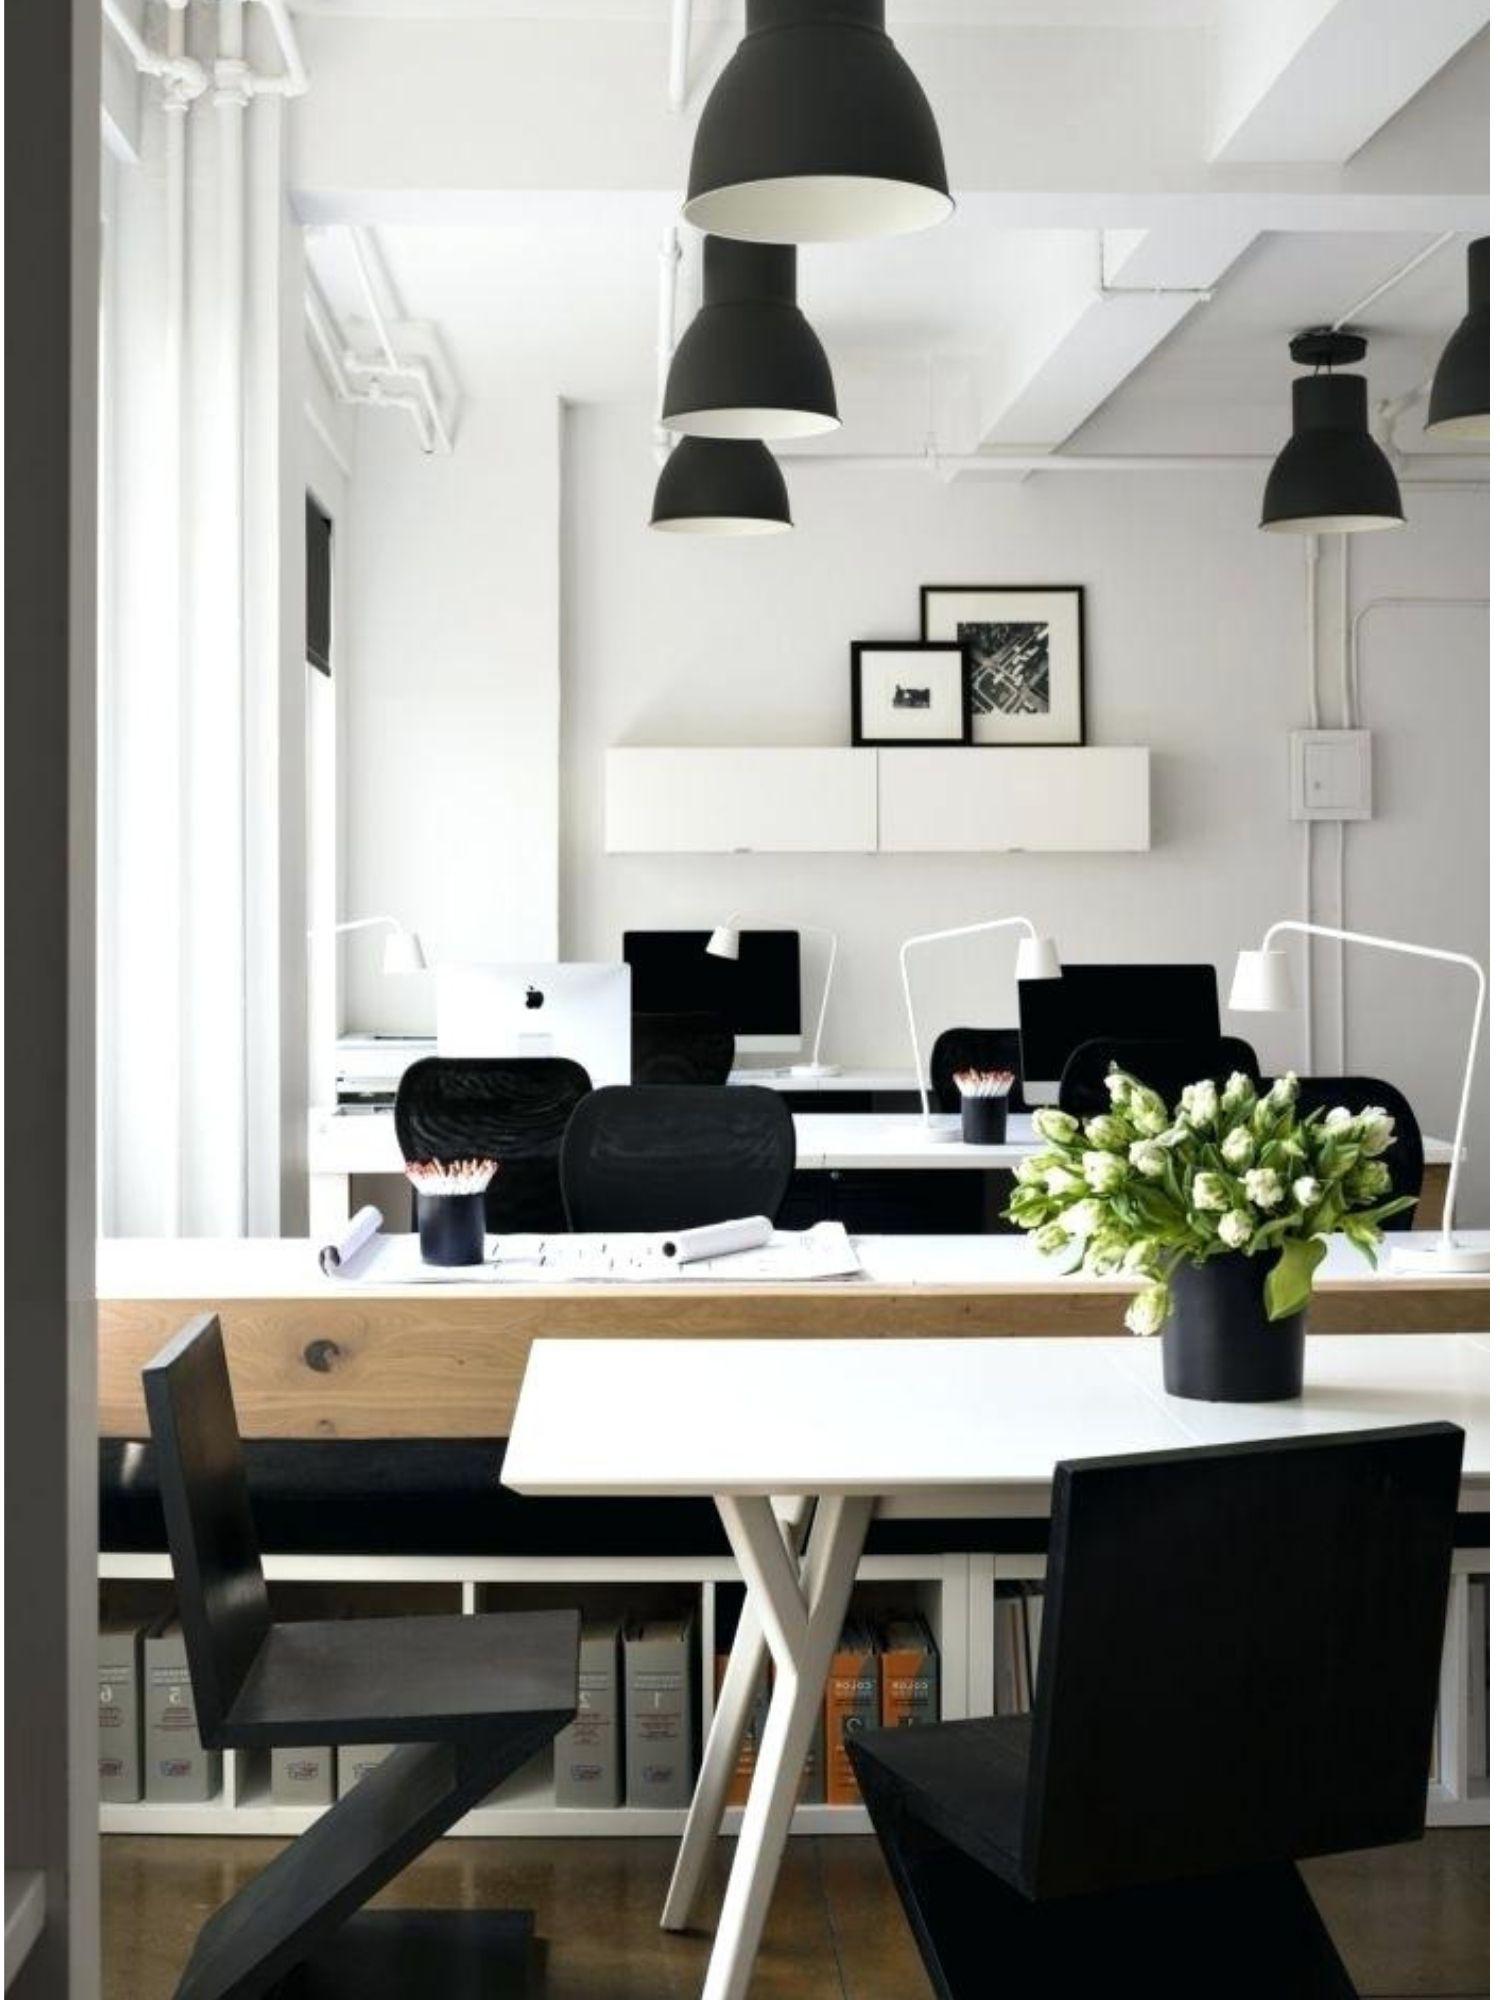 Top 7 Modern Interior Design Concepts Interior Design Home Office Design Office Interior Design